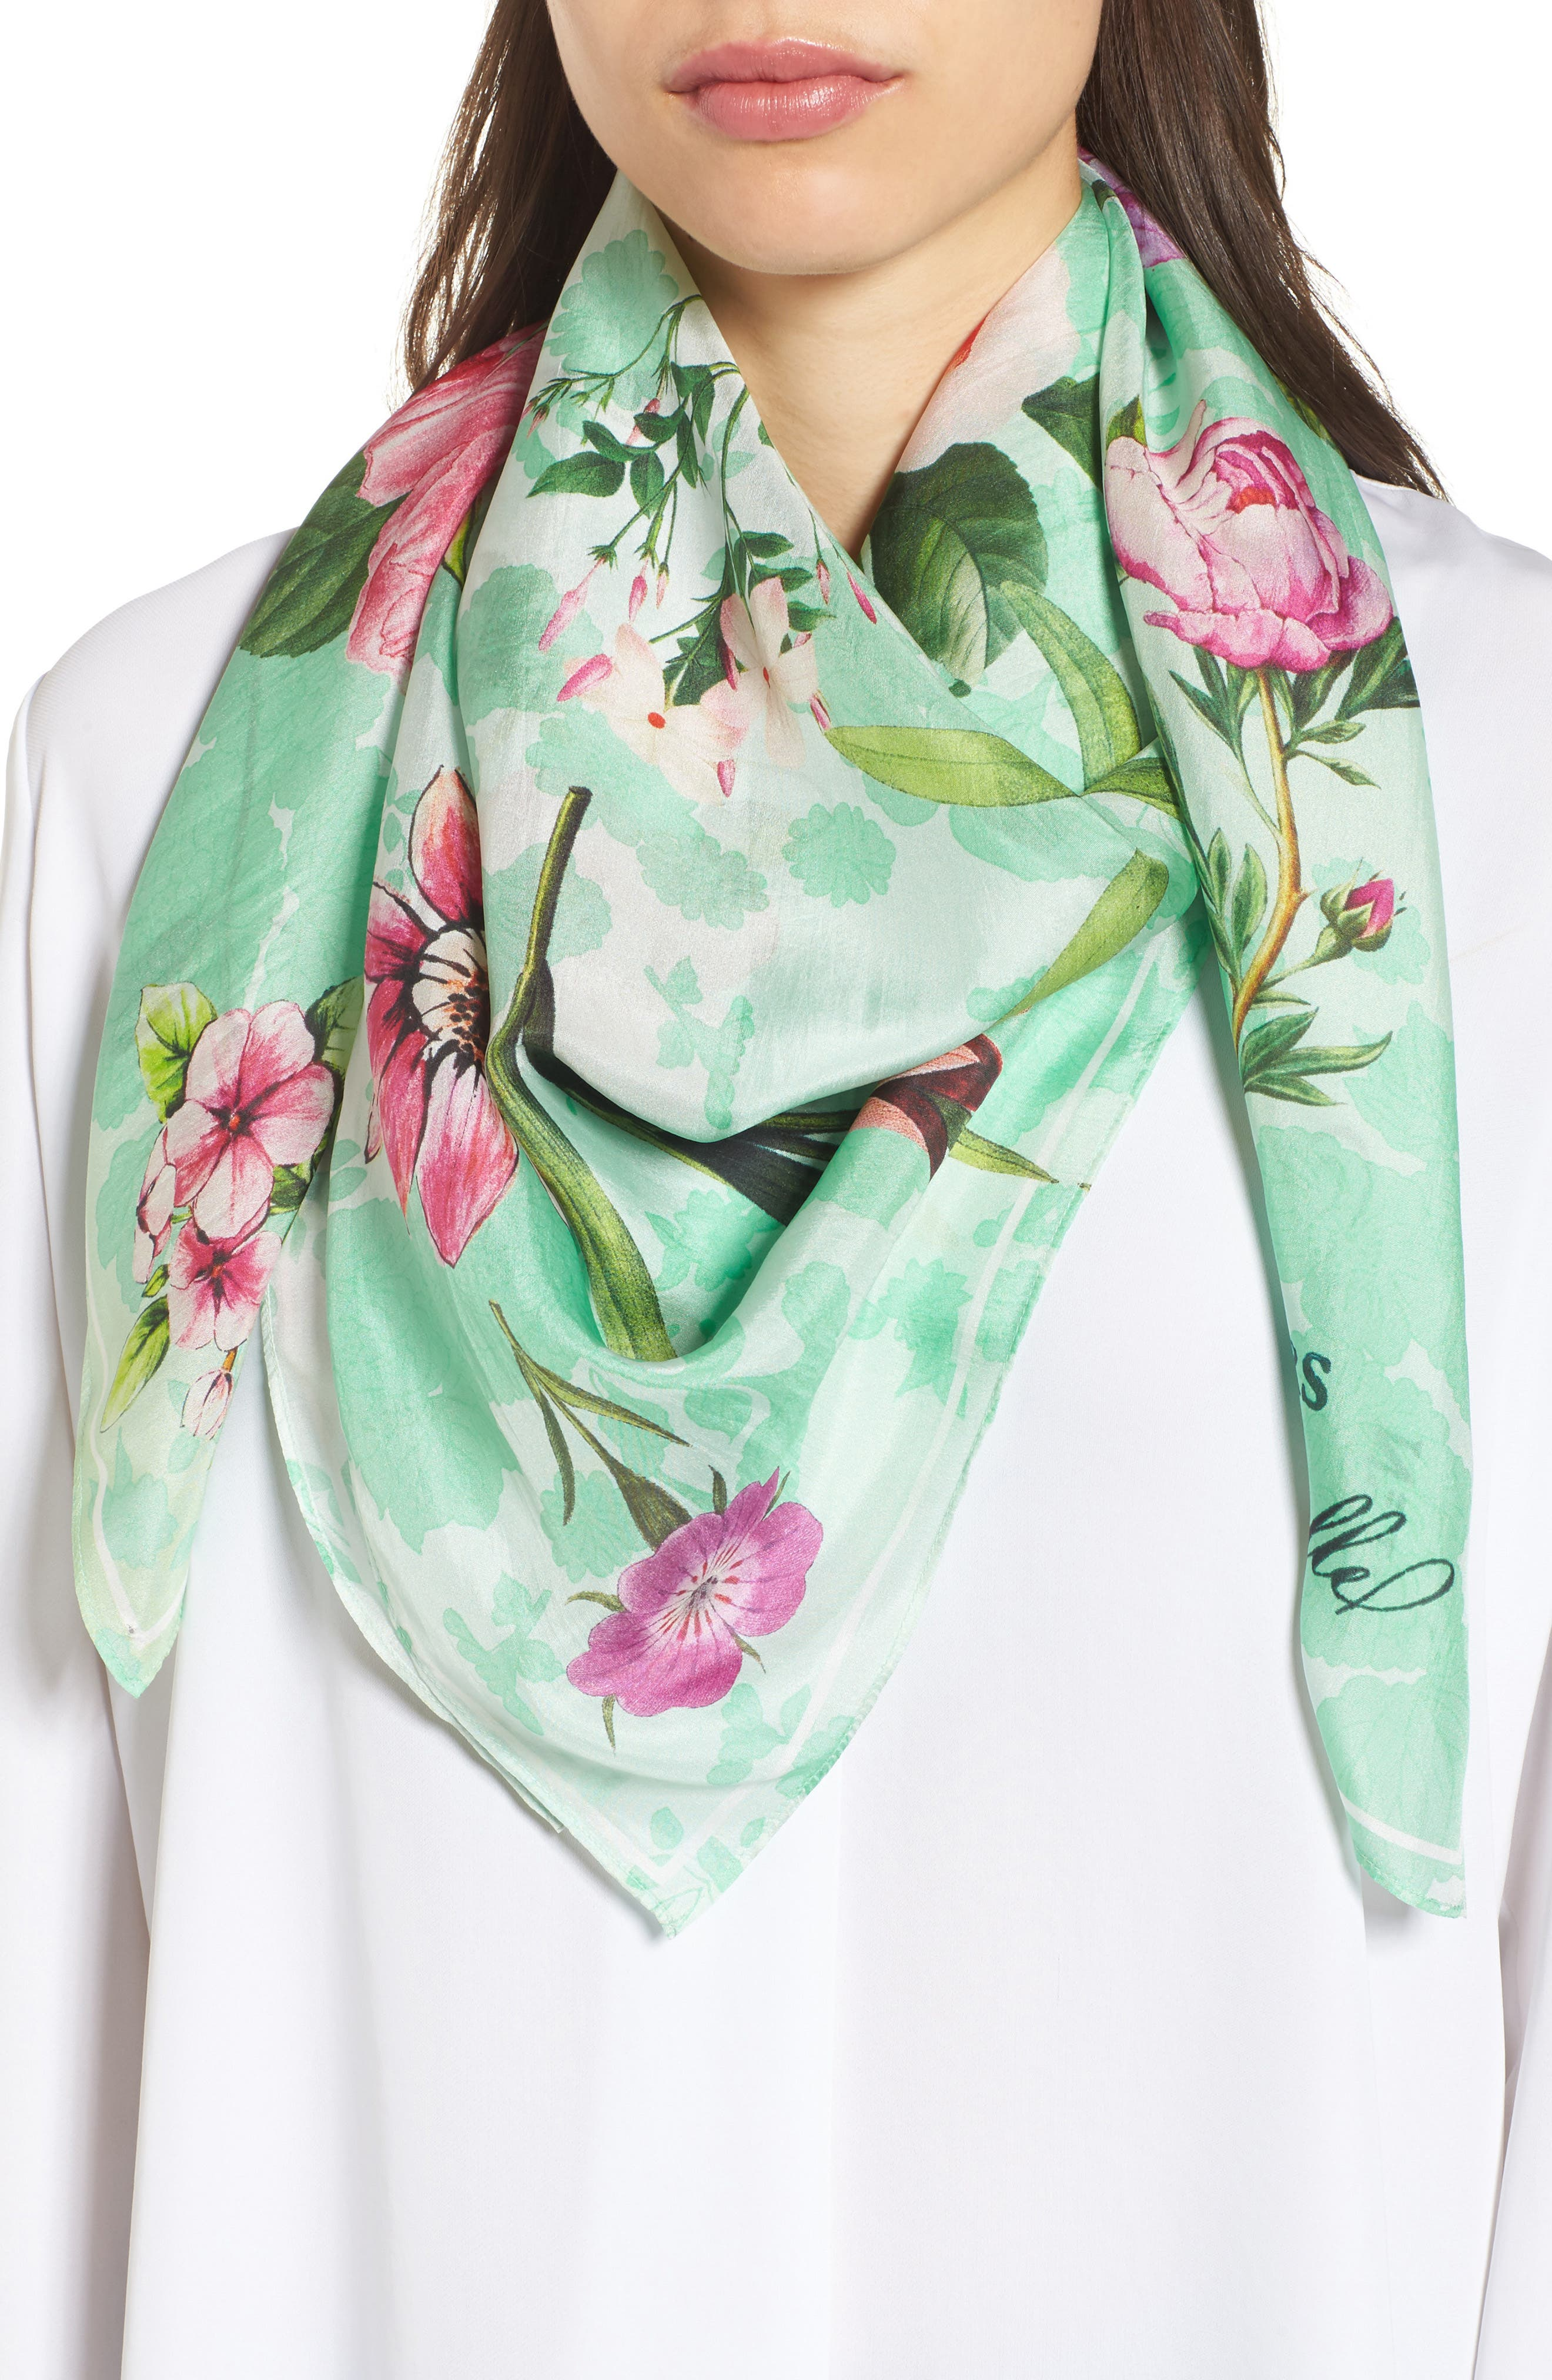 Print Square Silk Scarf,                         Main,                         color, Green Magical Botanicals Print